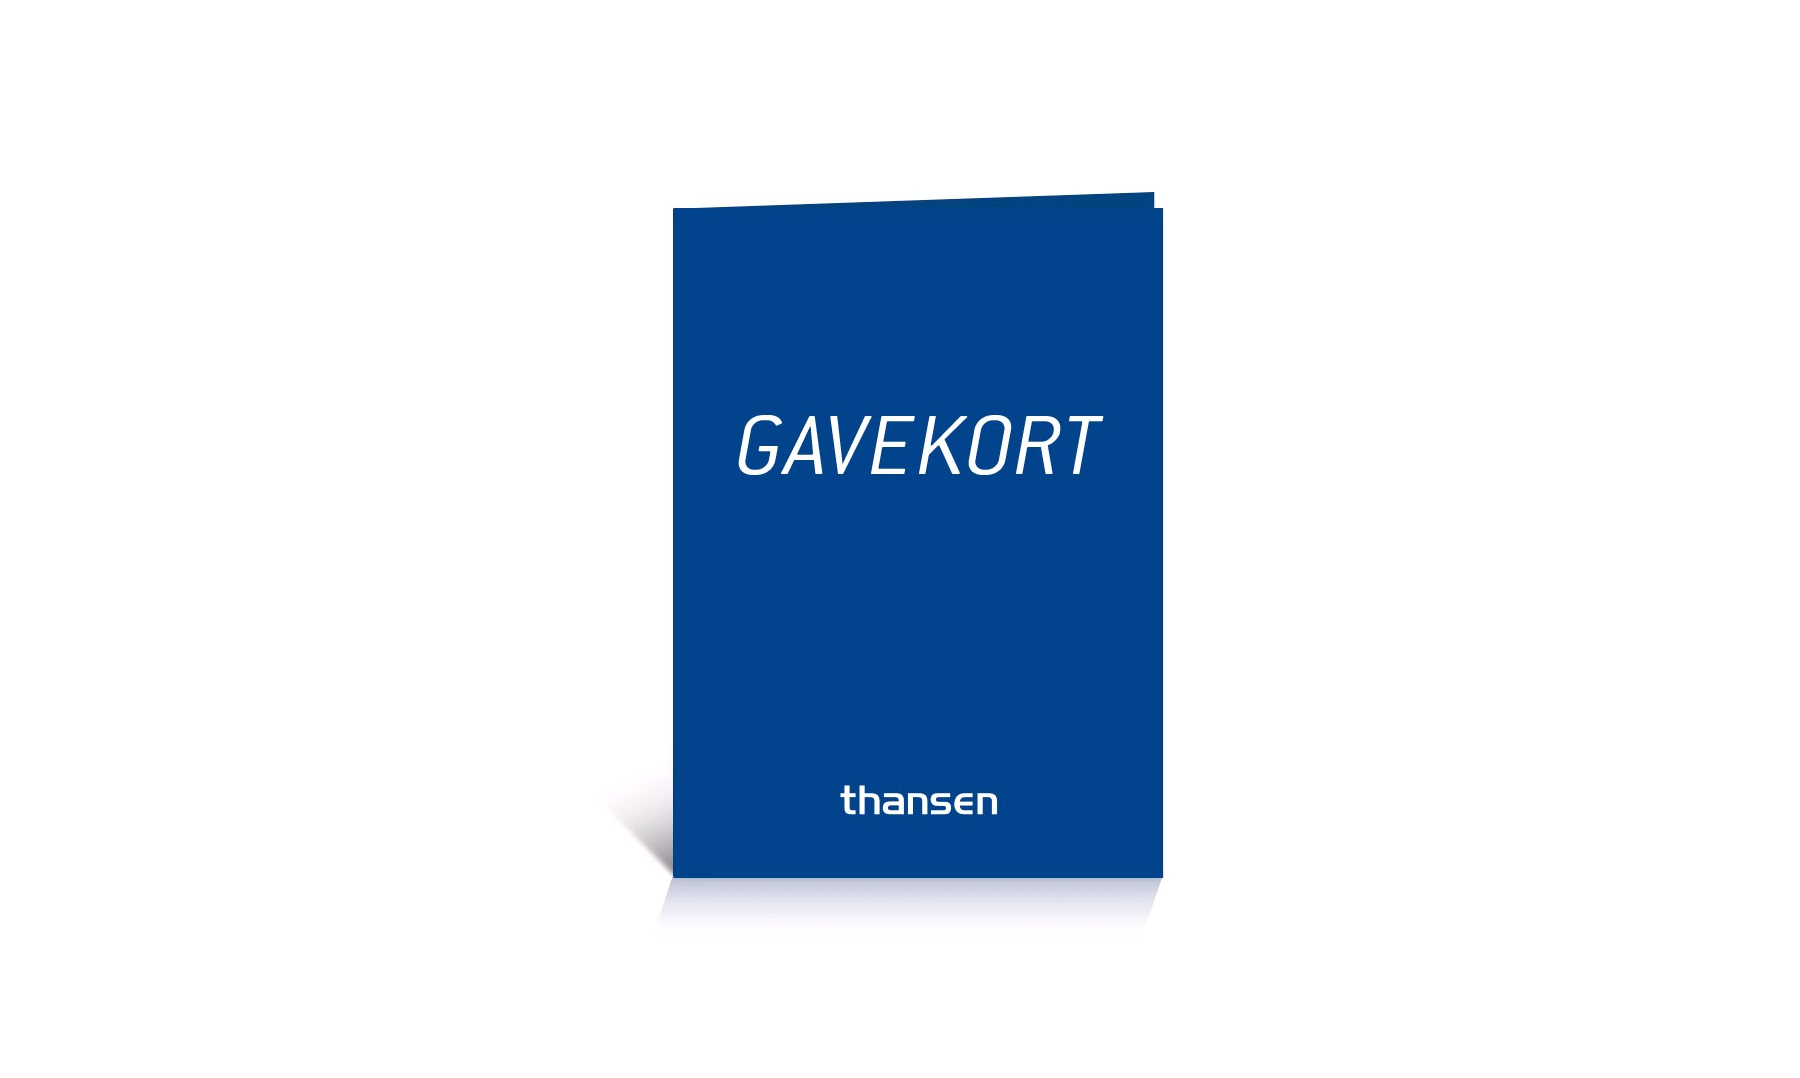 12df67a1fef Gavekort - 250 kroner - Gavekort til thansen - thansen.dk